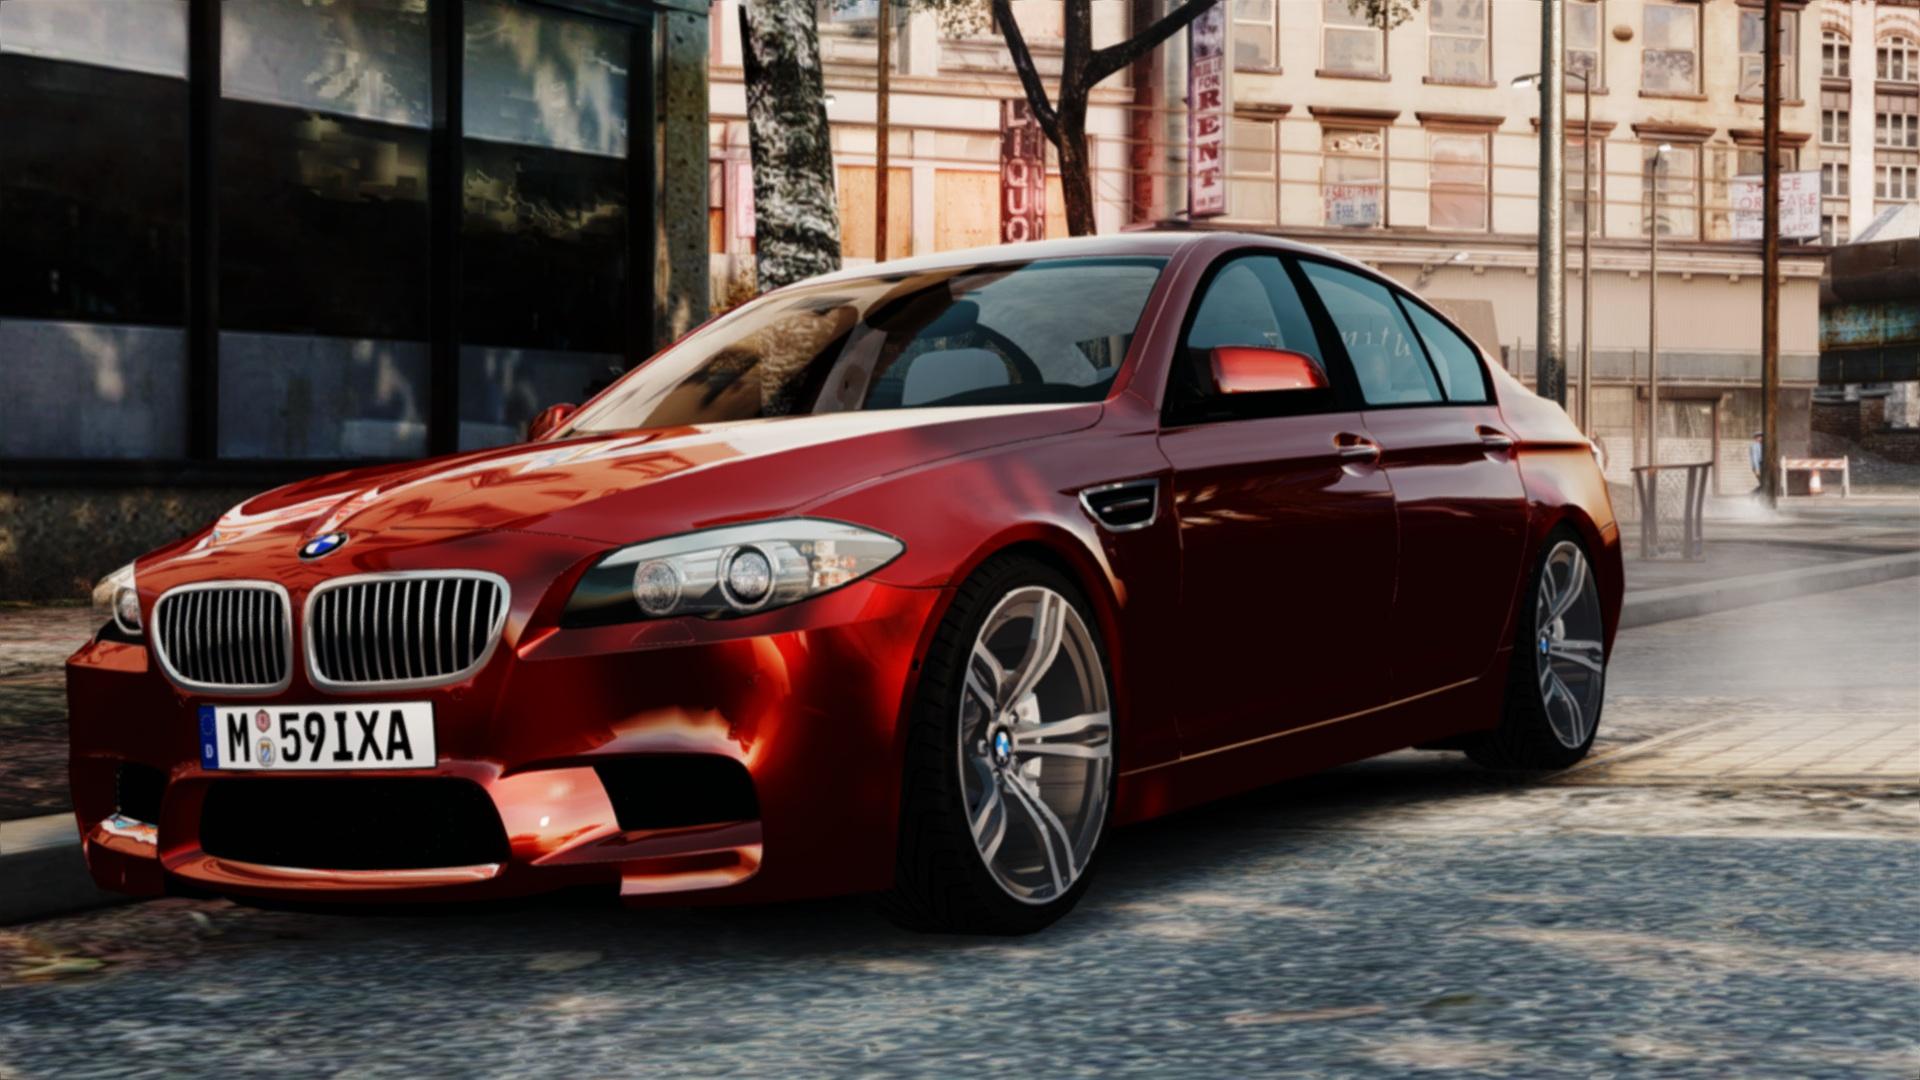 Gta 5 Cars Wallpaper Download Gta Modding Com Download Area 187 Gta Iv 187 Cars 187 Bmw M5 F10